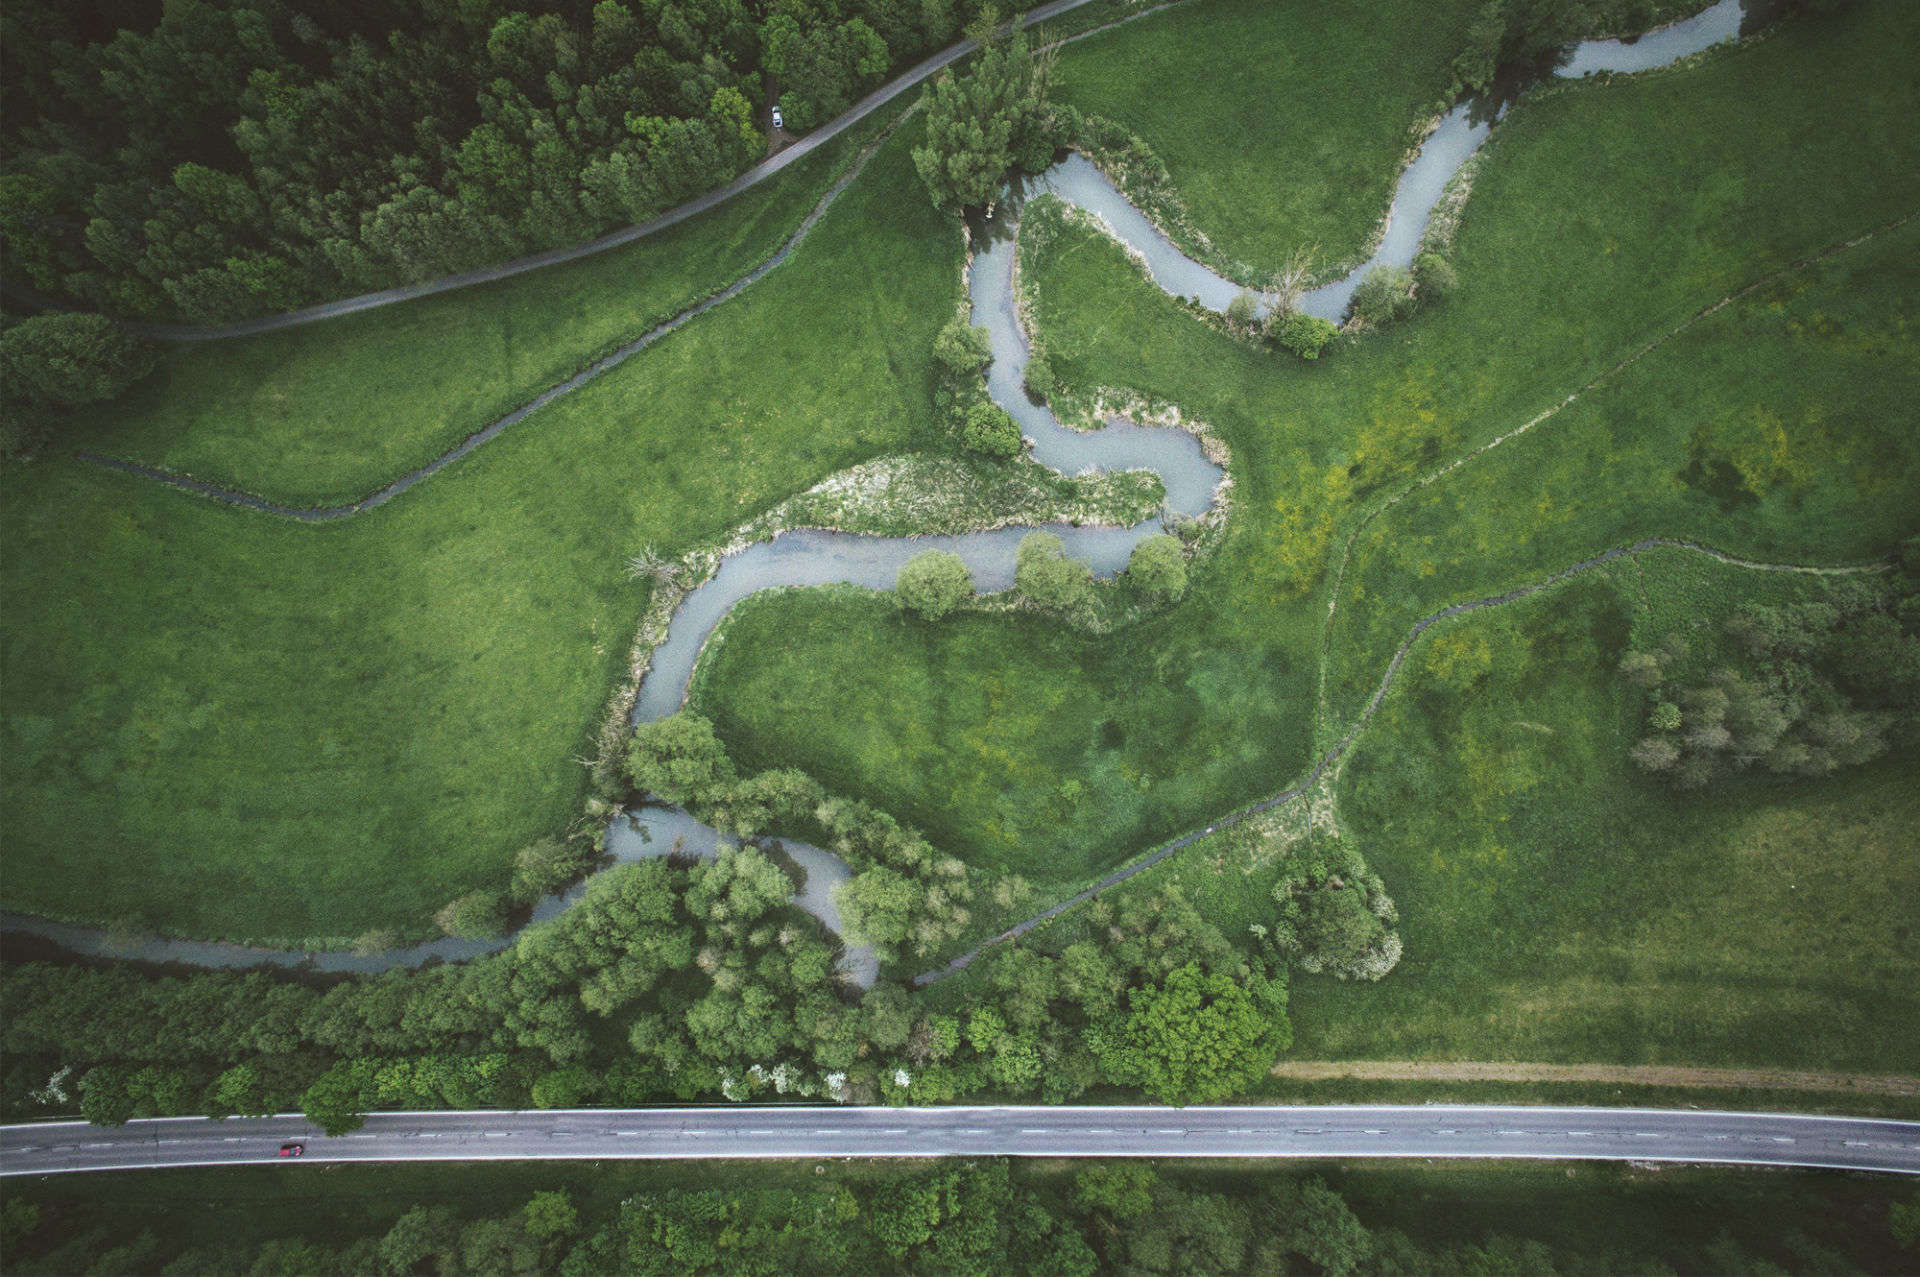 Klettern - Amberg Sulzbacher Land